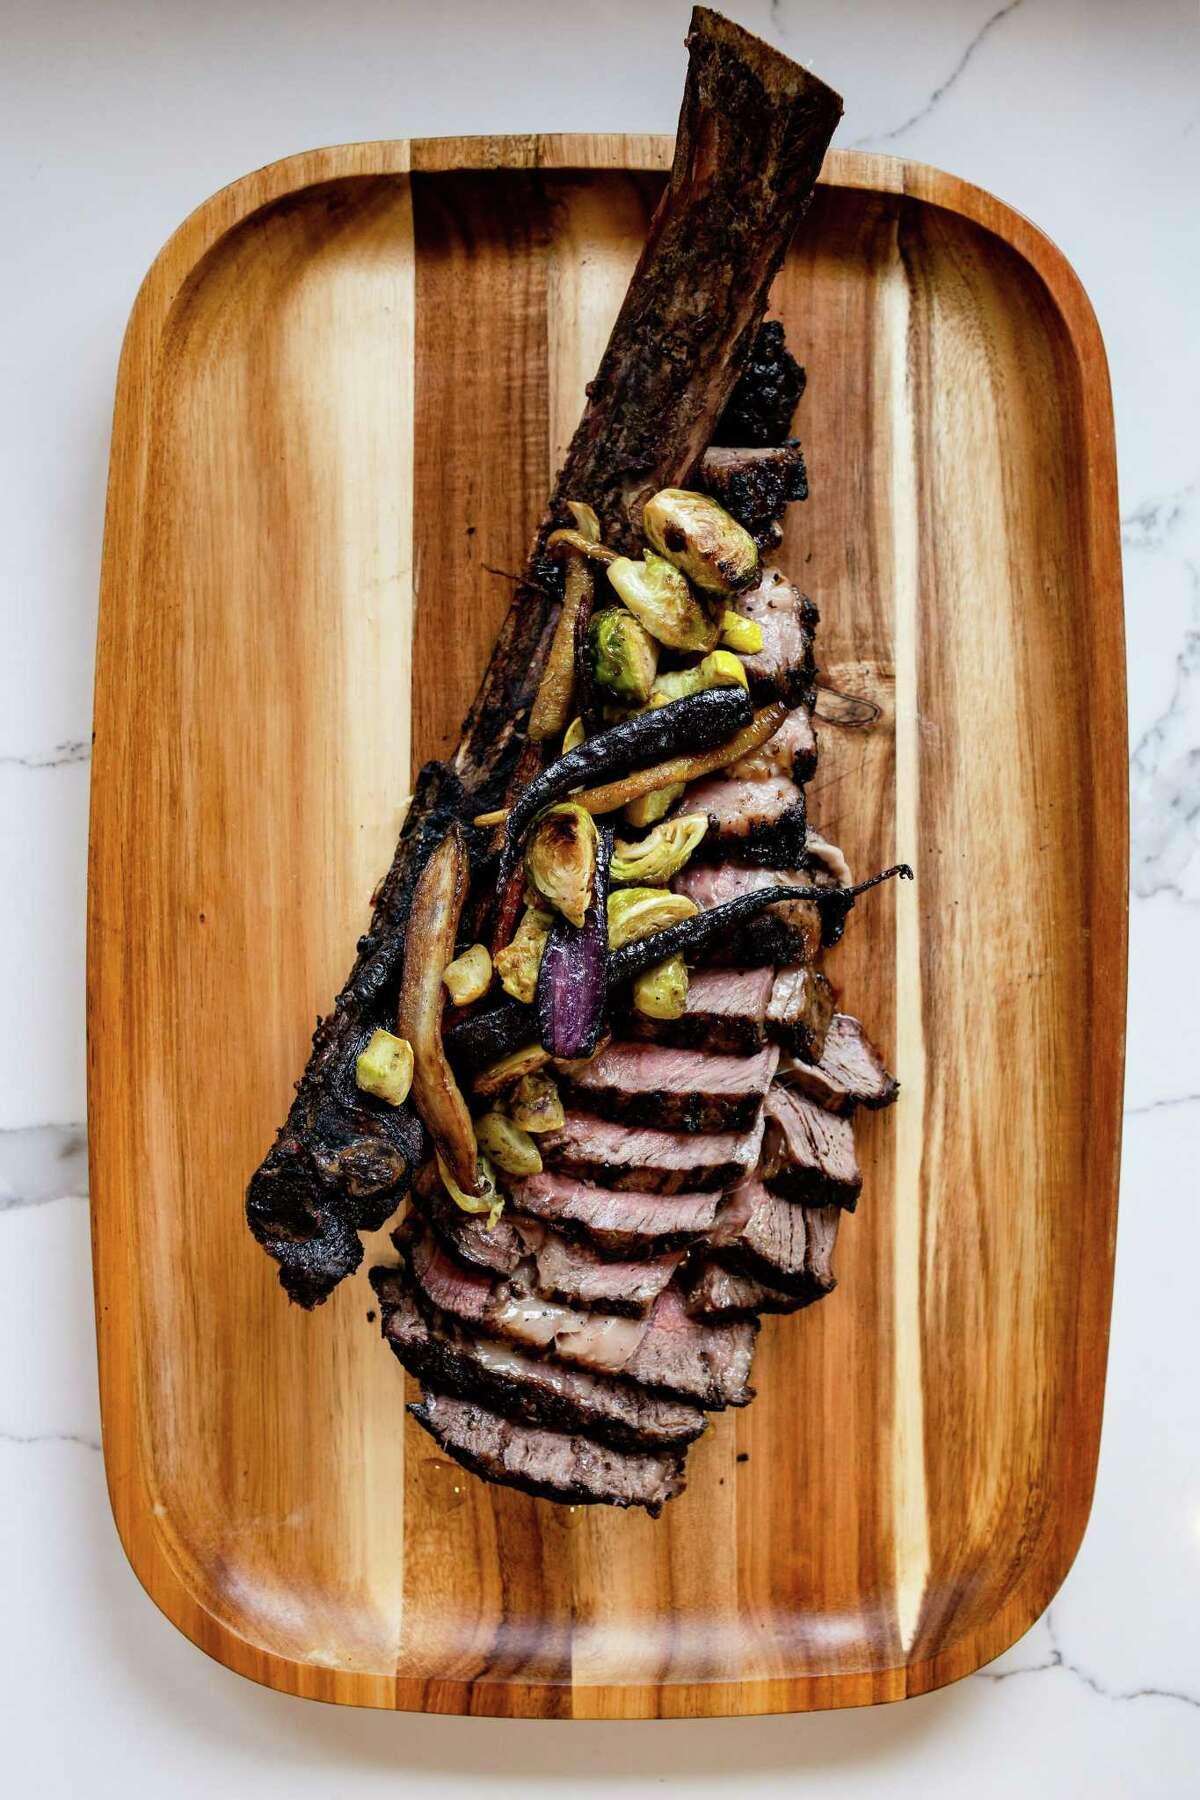 Tomahawk riveye a la Fiorentina (stea with rosemary, garlic, olive oil, lemon zest and Maldon salt) at Bisou.